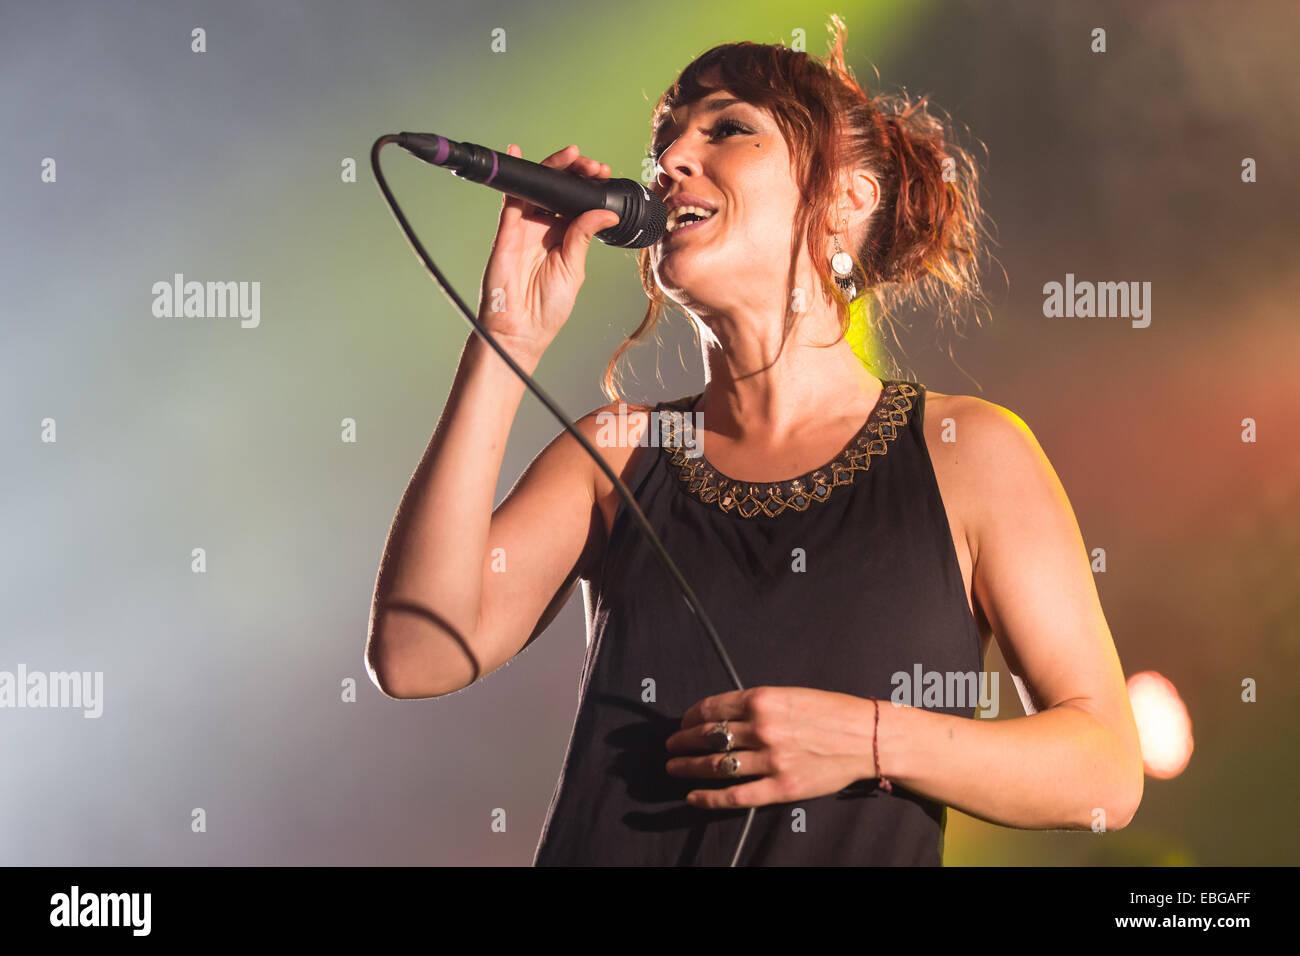 Singer Zaz (ZAZ) biography of the French singer, photo, listen to songs online 2018 96